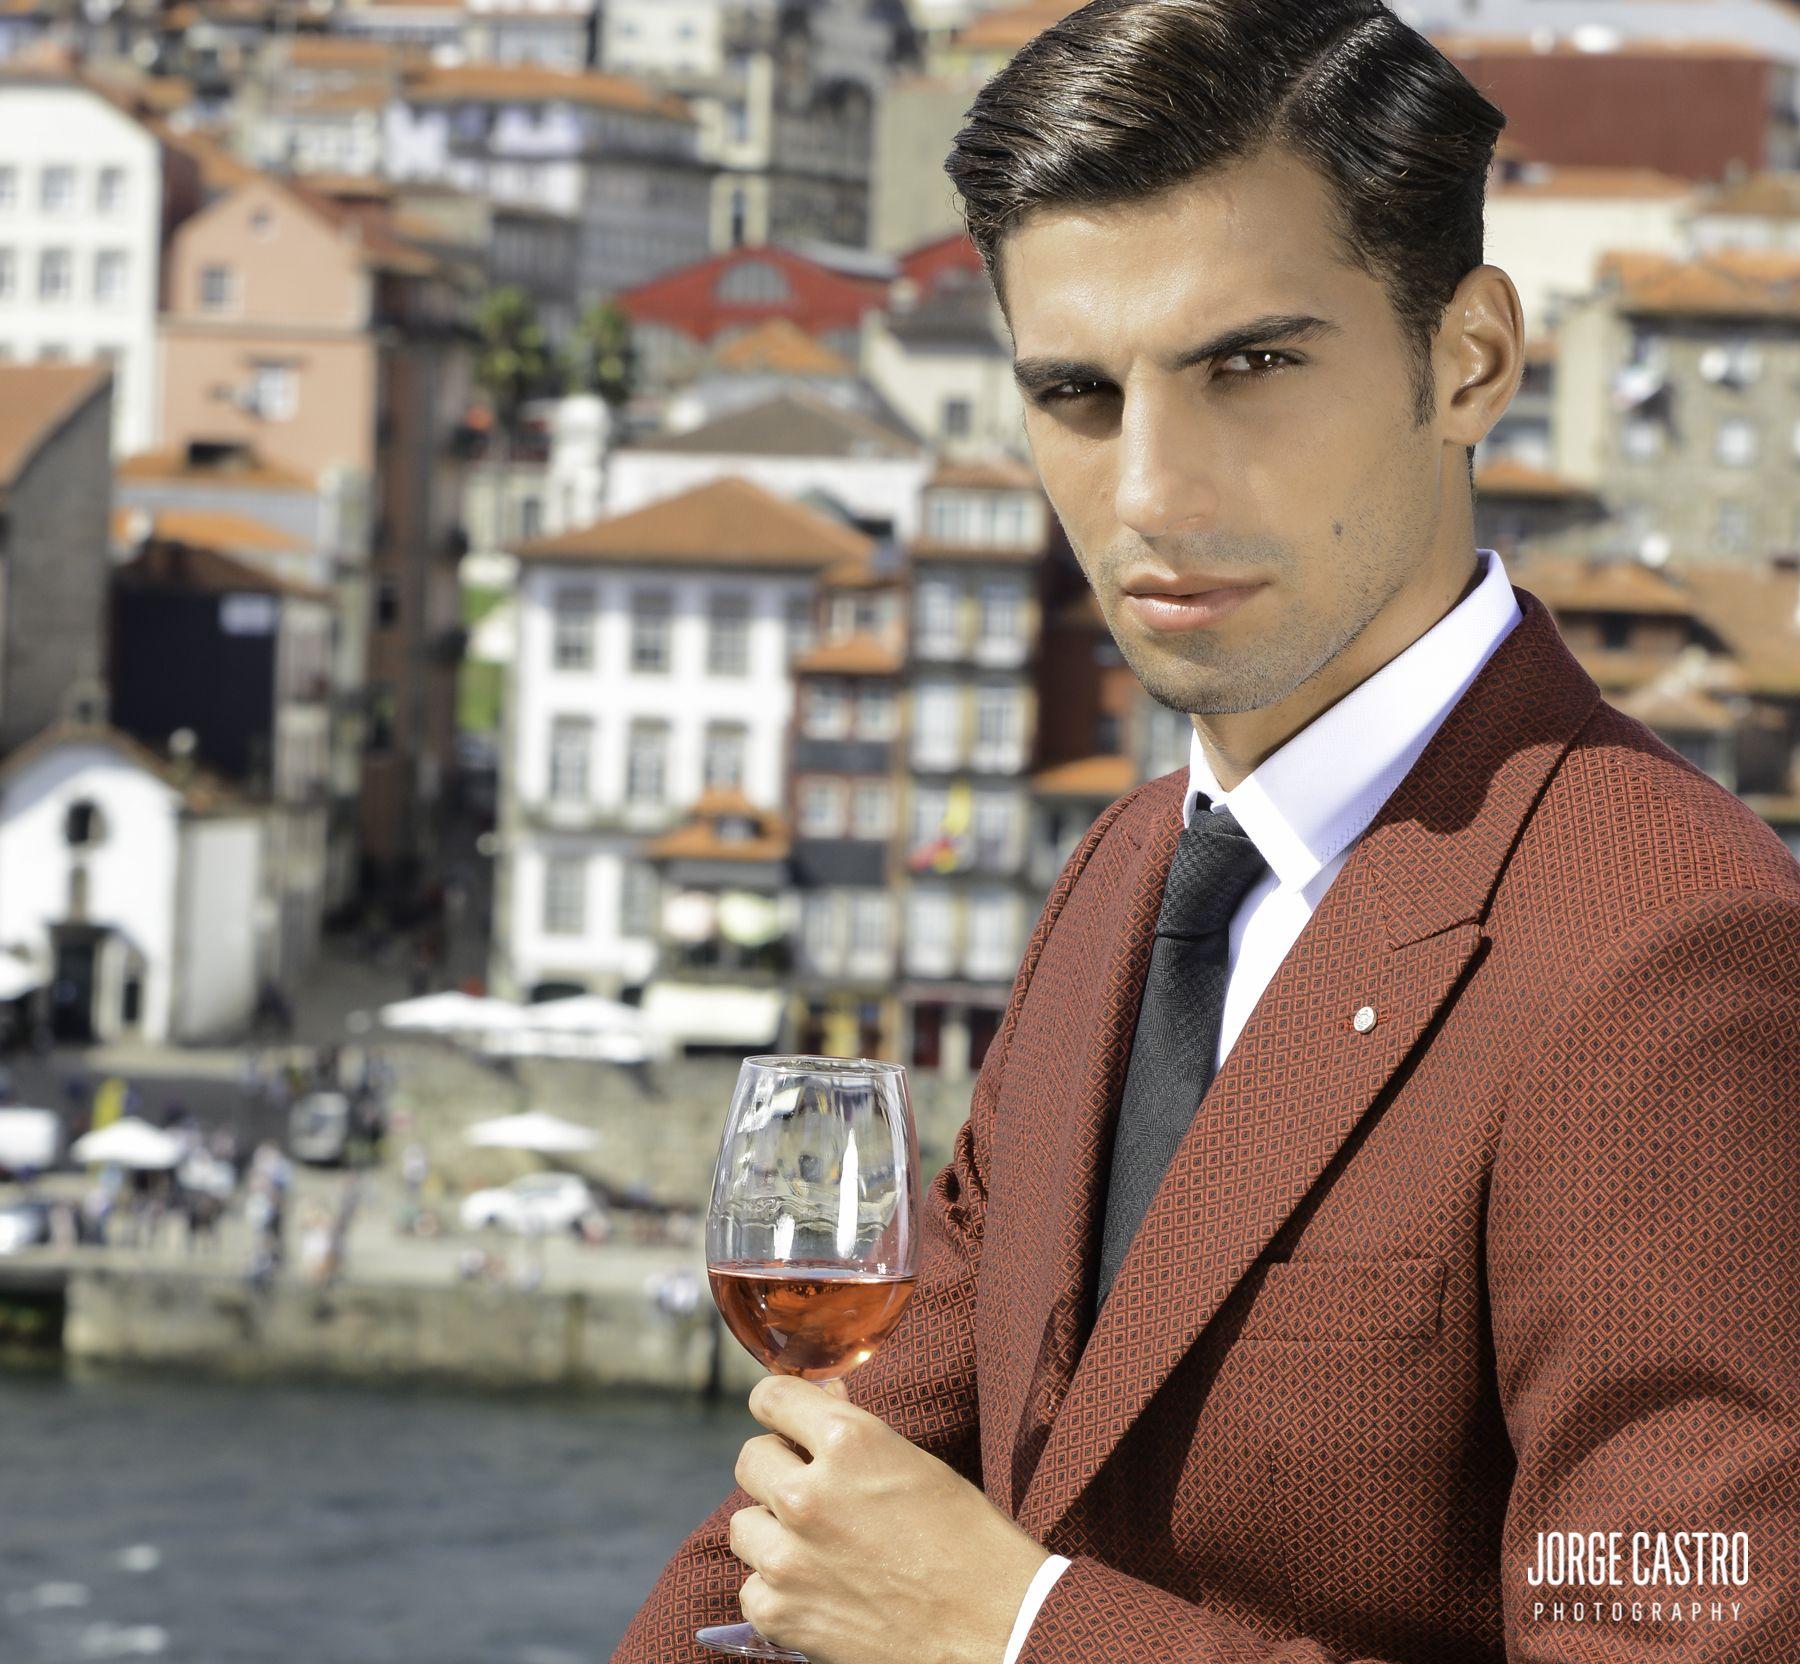 #outonoinverno16 #vicriporto #gofrey #photography #porto #portugal #portocruz #fashion #shooting #moda #vinhodoporto #clasico #jóias #Photo #toniguy #hairdres #stiling #franciscofaria #karacteragenci #menfashion #jorgecastro-photography.com